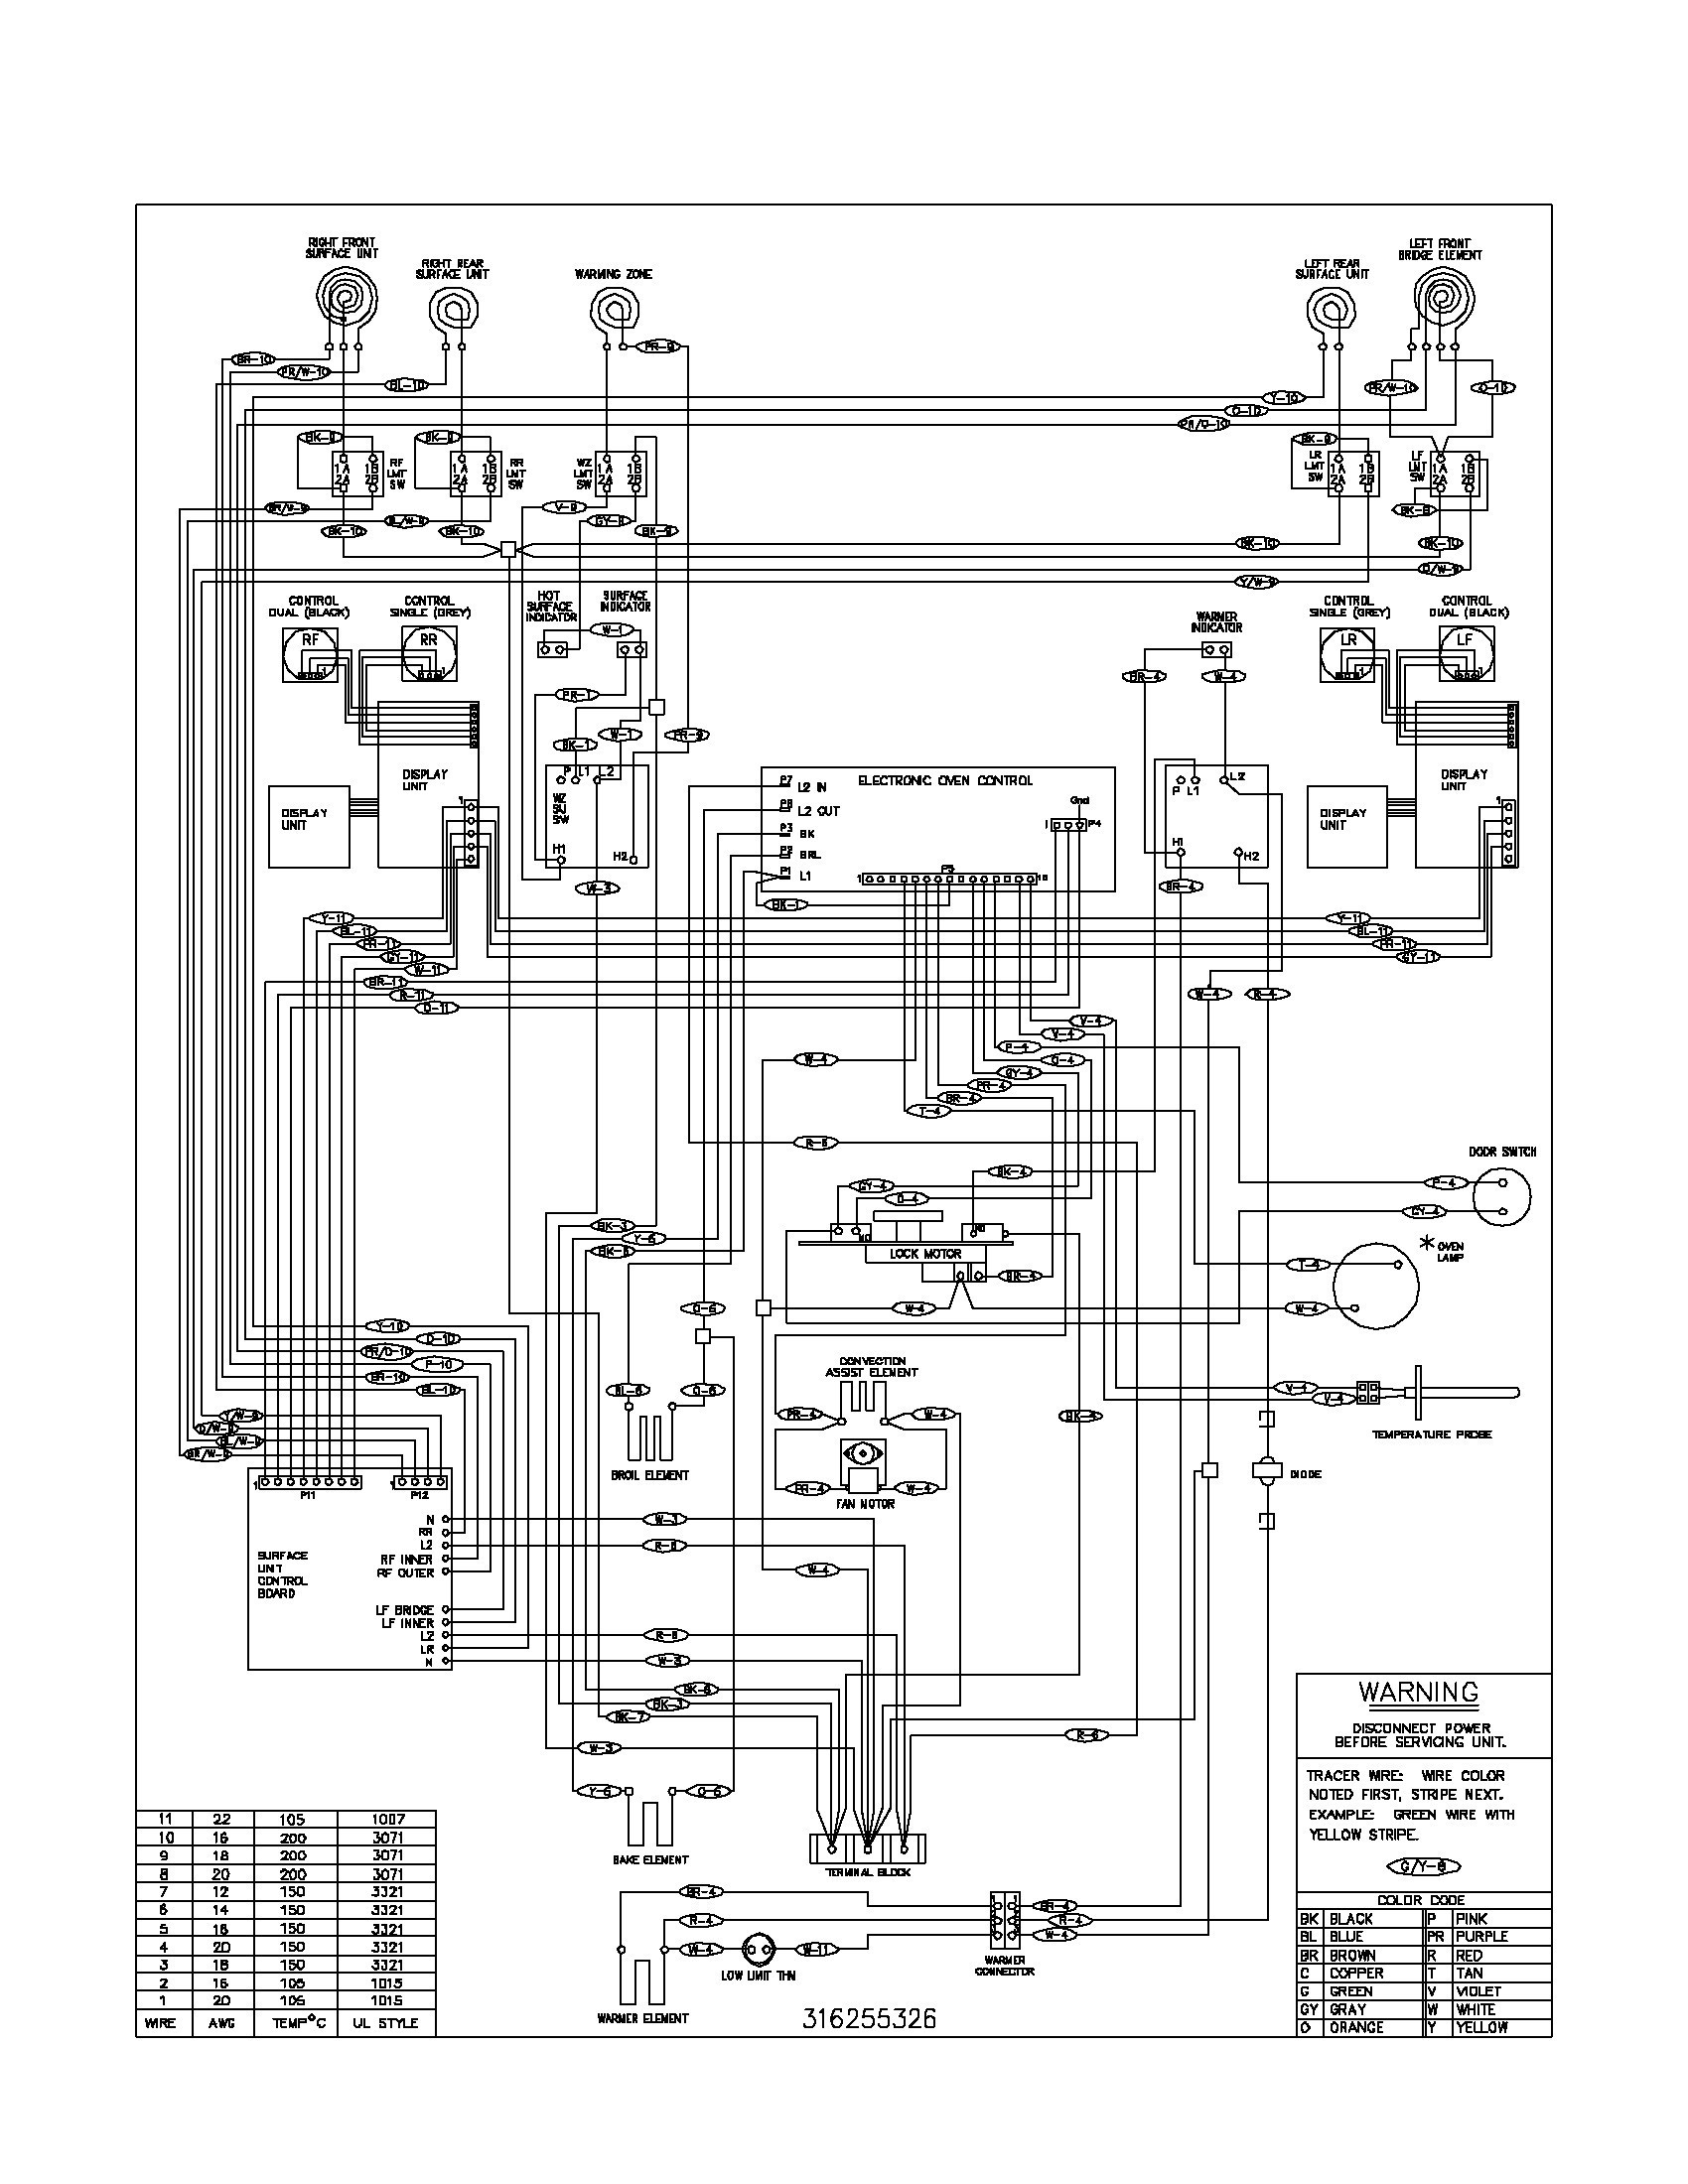 Heil Electric Furnace Wiring Diagram -Wiring Mobile Electric Home Diagram  Furnace 1983ge | Begeboy Wiring Diagram SourceBegeboy Wiring Diagram Source